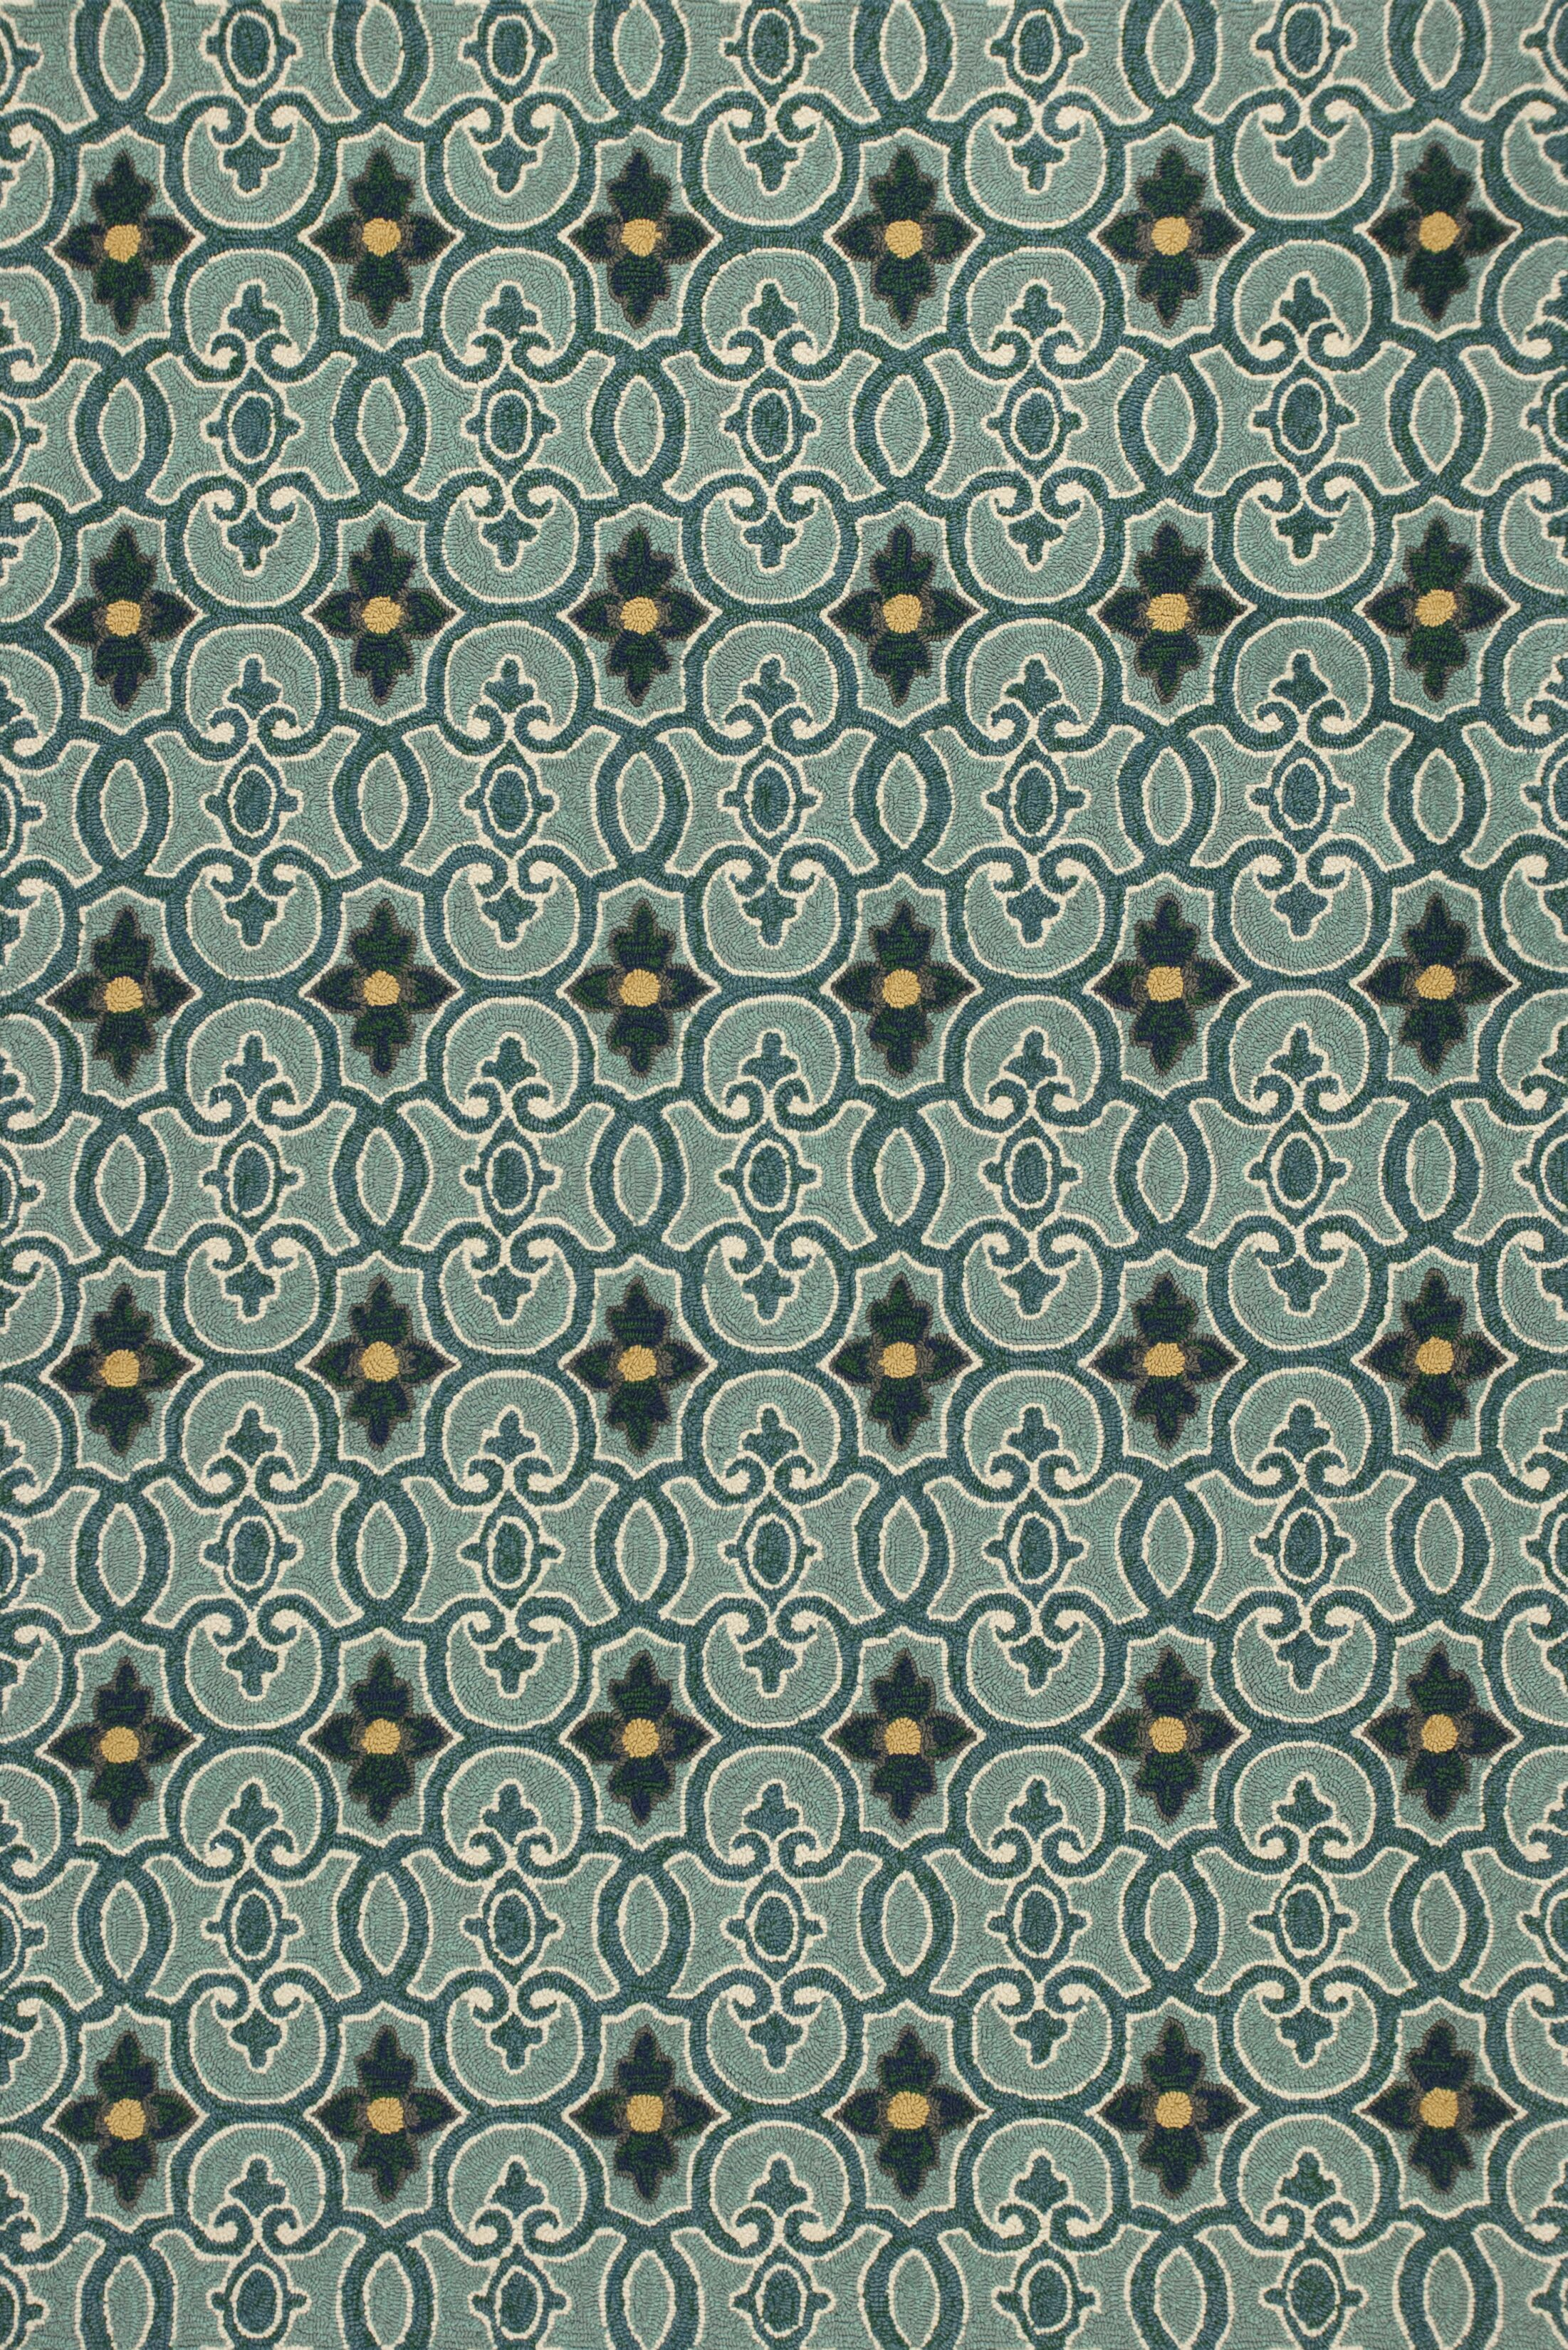 Edinburgh Handmade Teal Indoor/Outdoor Area Rug Rug Size: Rectangle 5' x 7'6